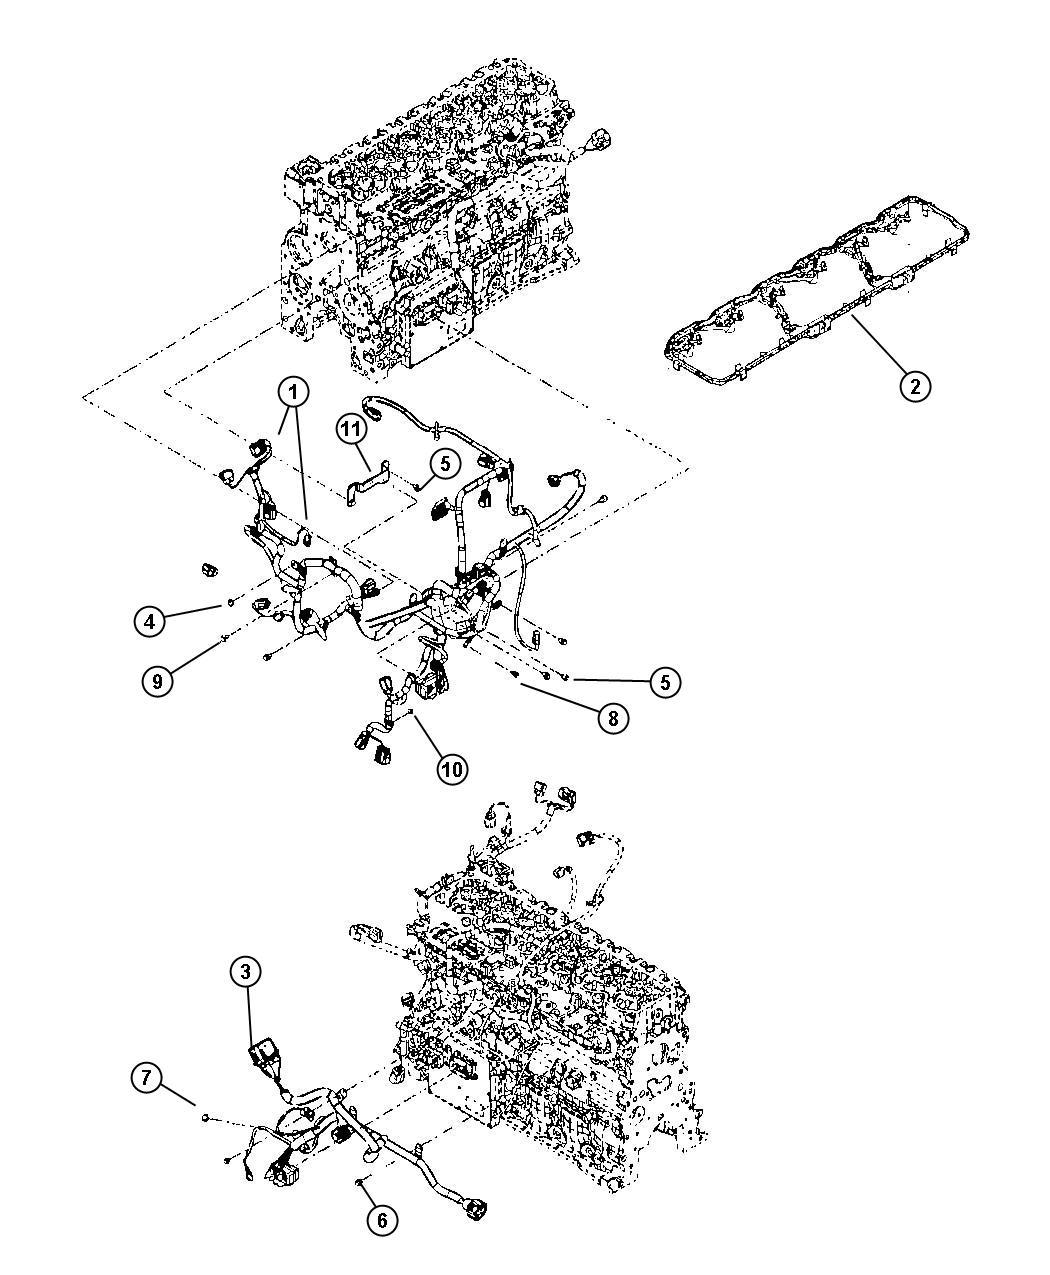 Dodge Ram 3500 Wiring. Engine. Tag #4990489, tagged